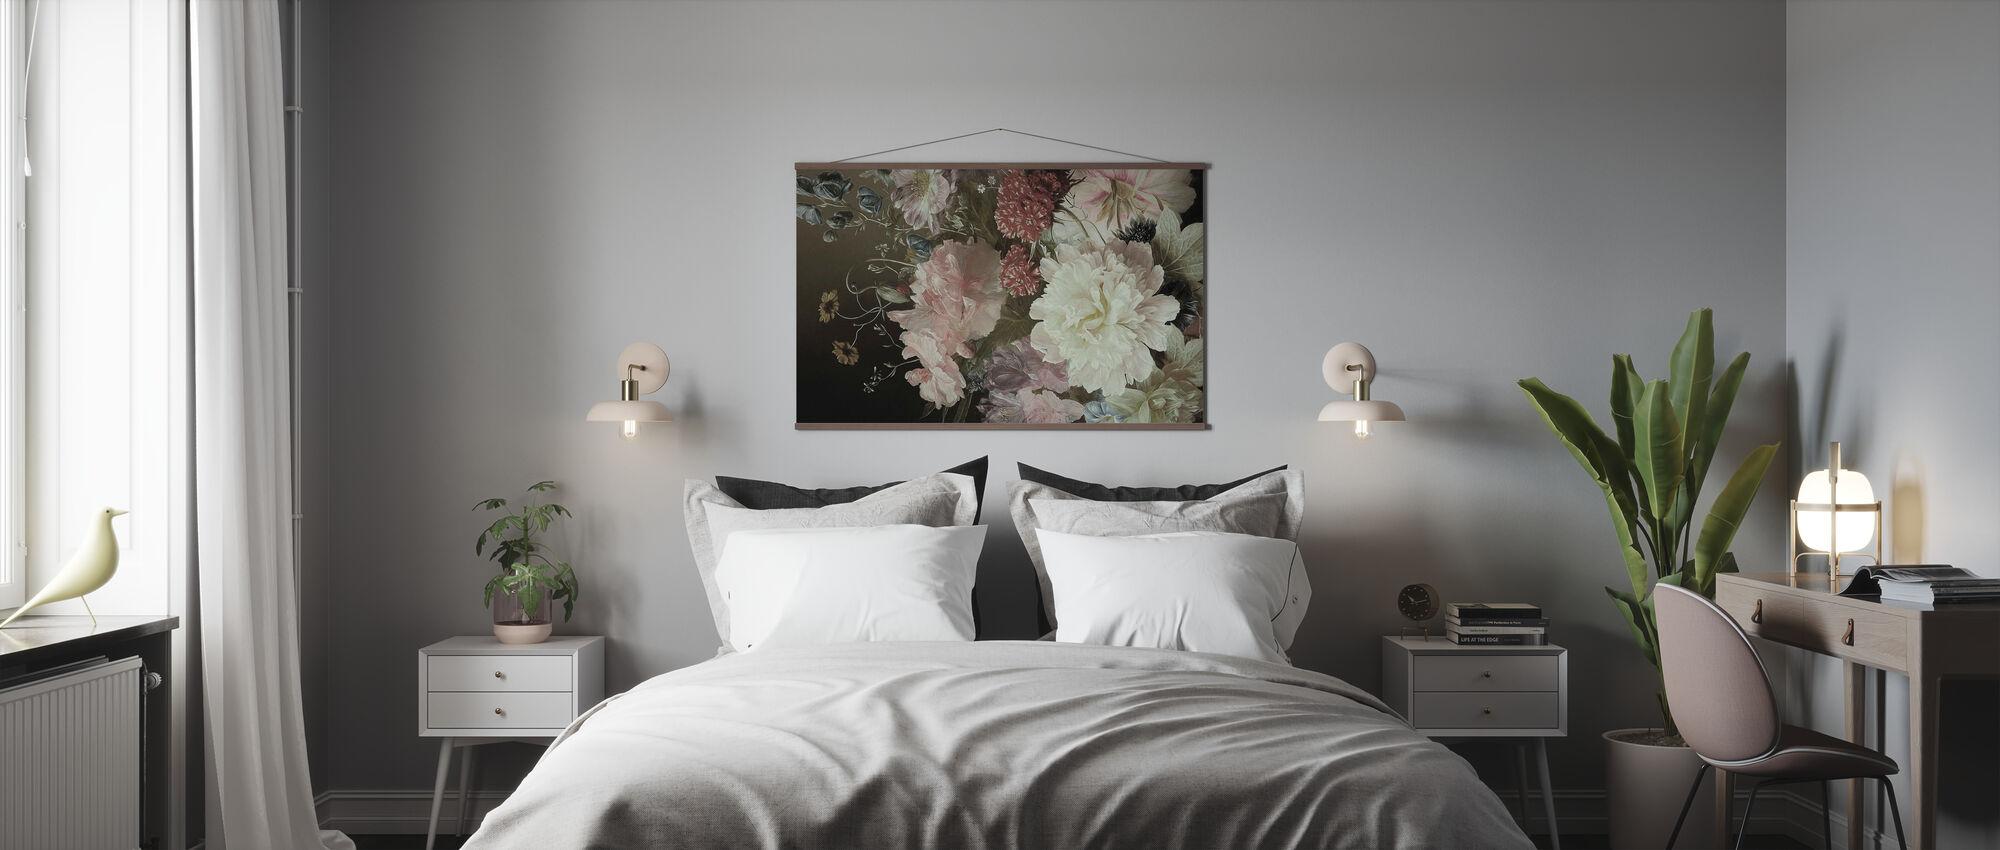 Witte Pionen - Poster - Slaapkamer